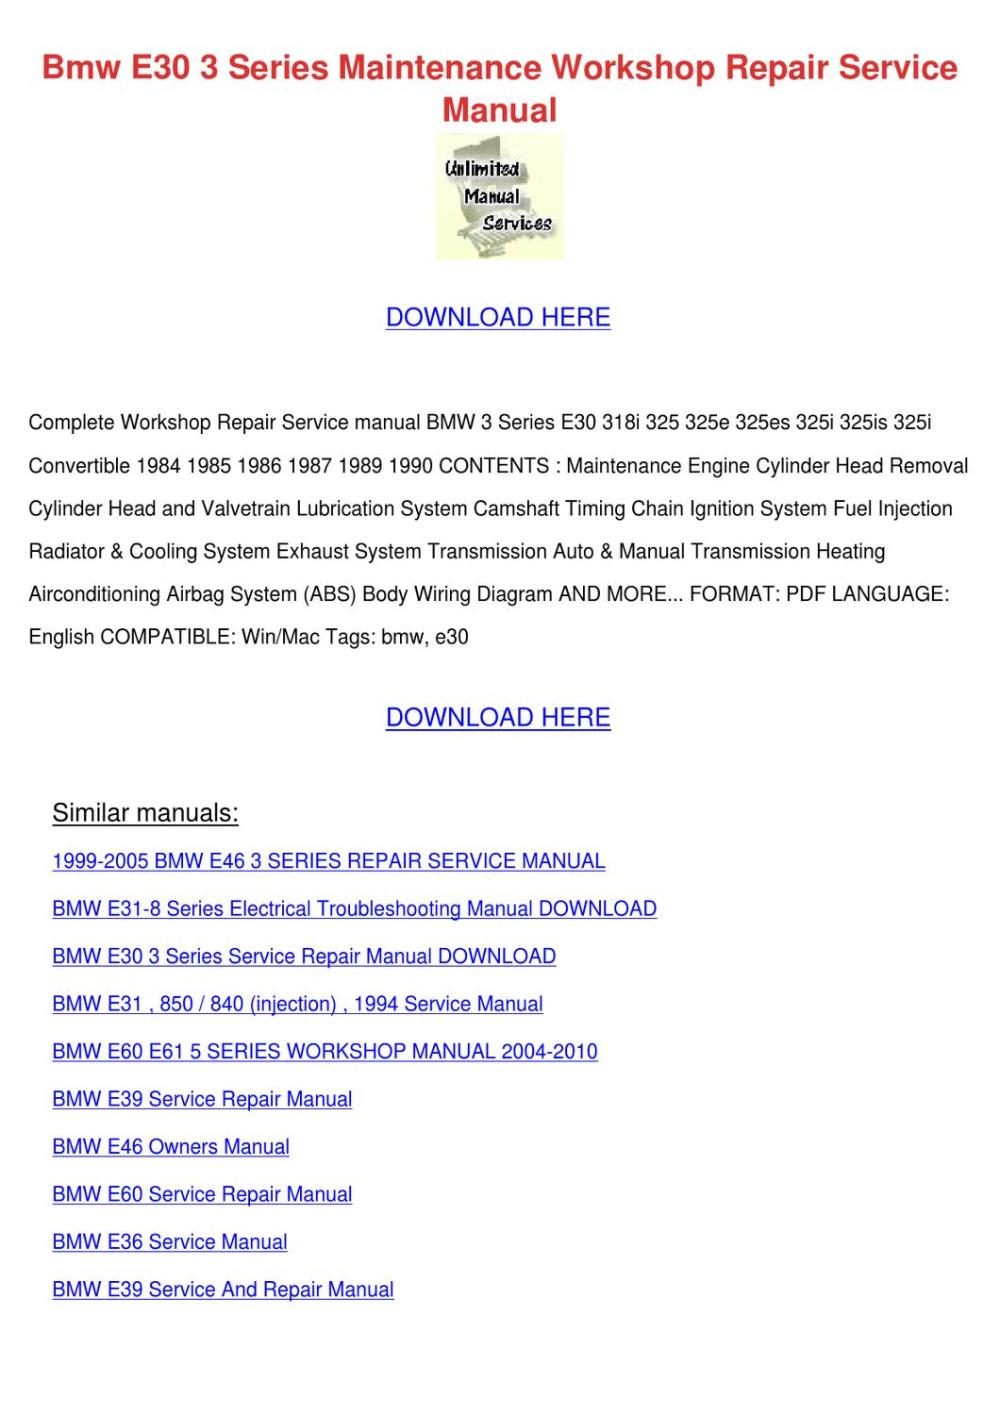 medium resolution of bmw e30 3 series maintenance workshop repair